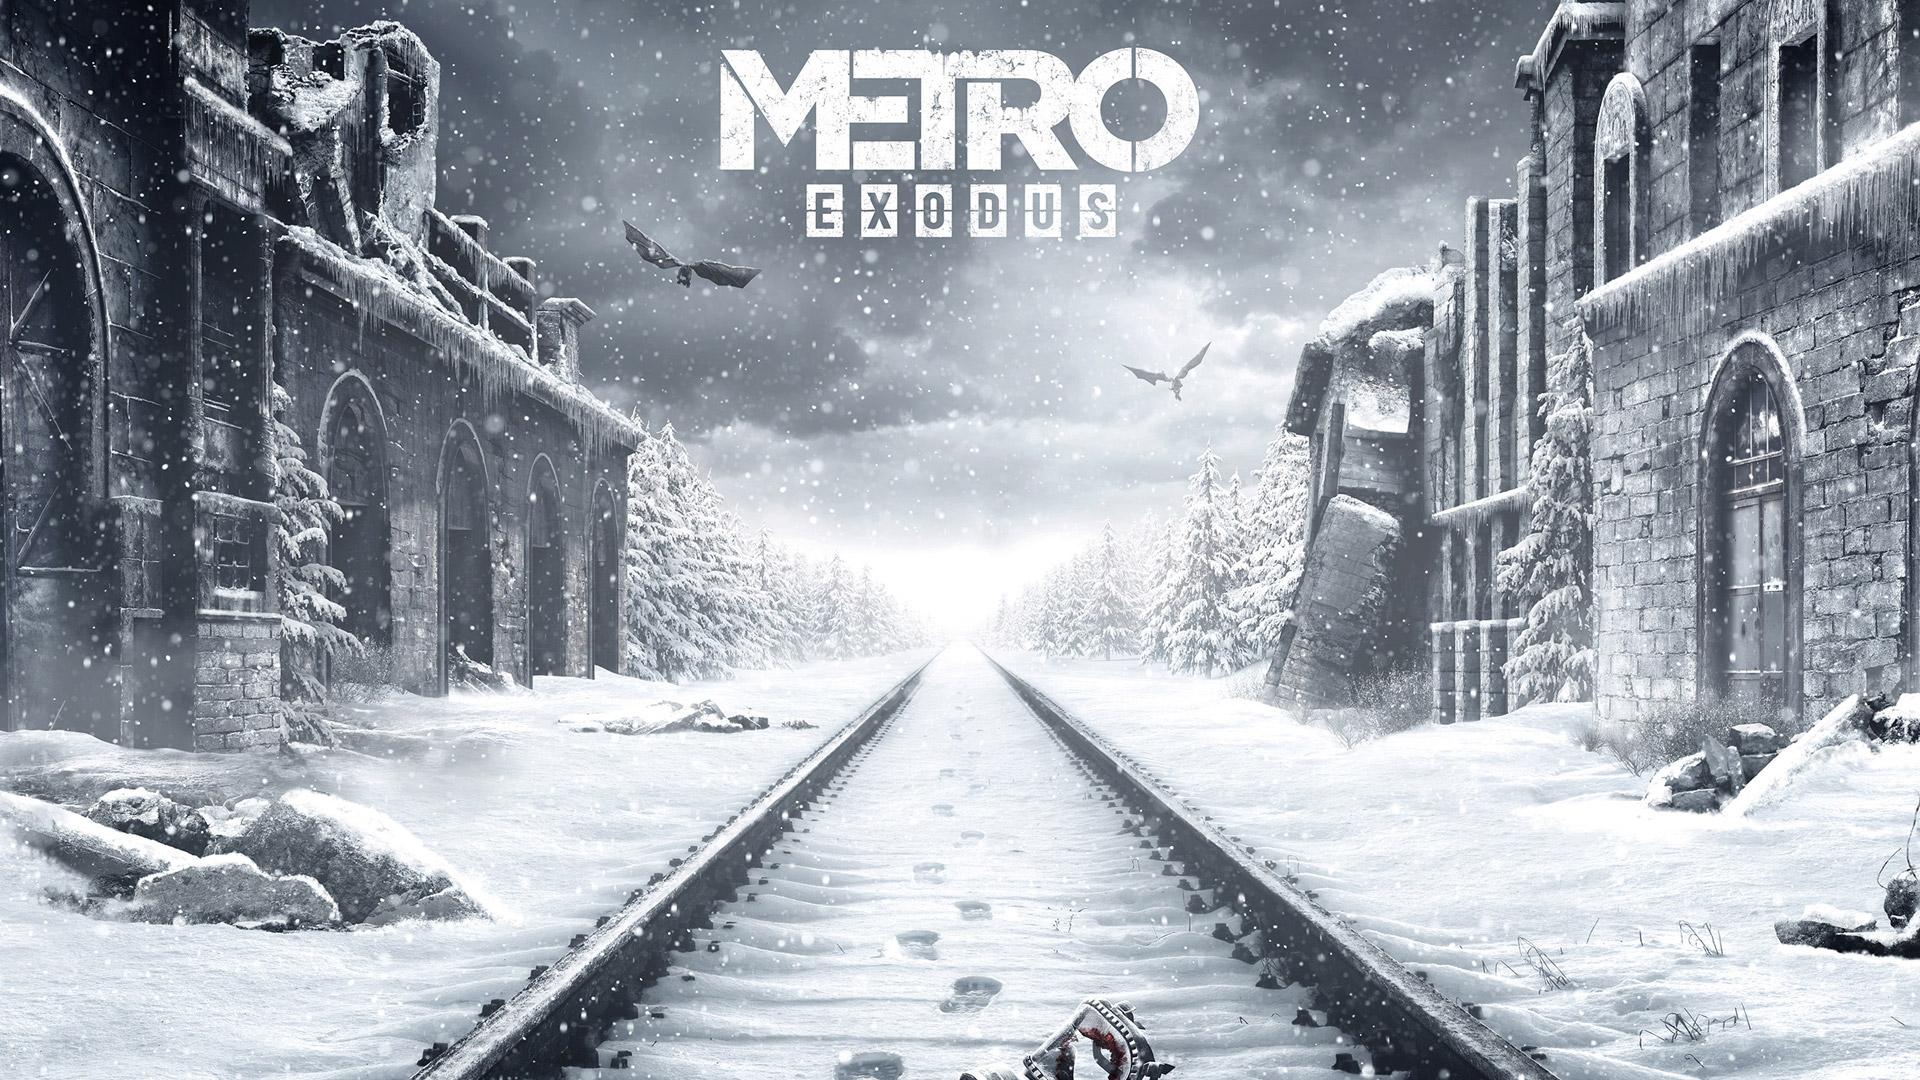 Free Metro Exodus Wallpaper in 1920x1080